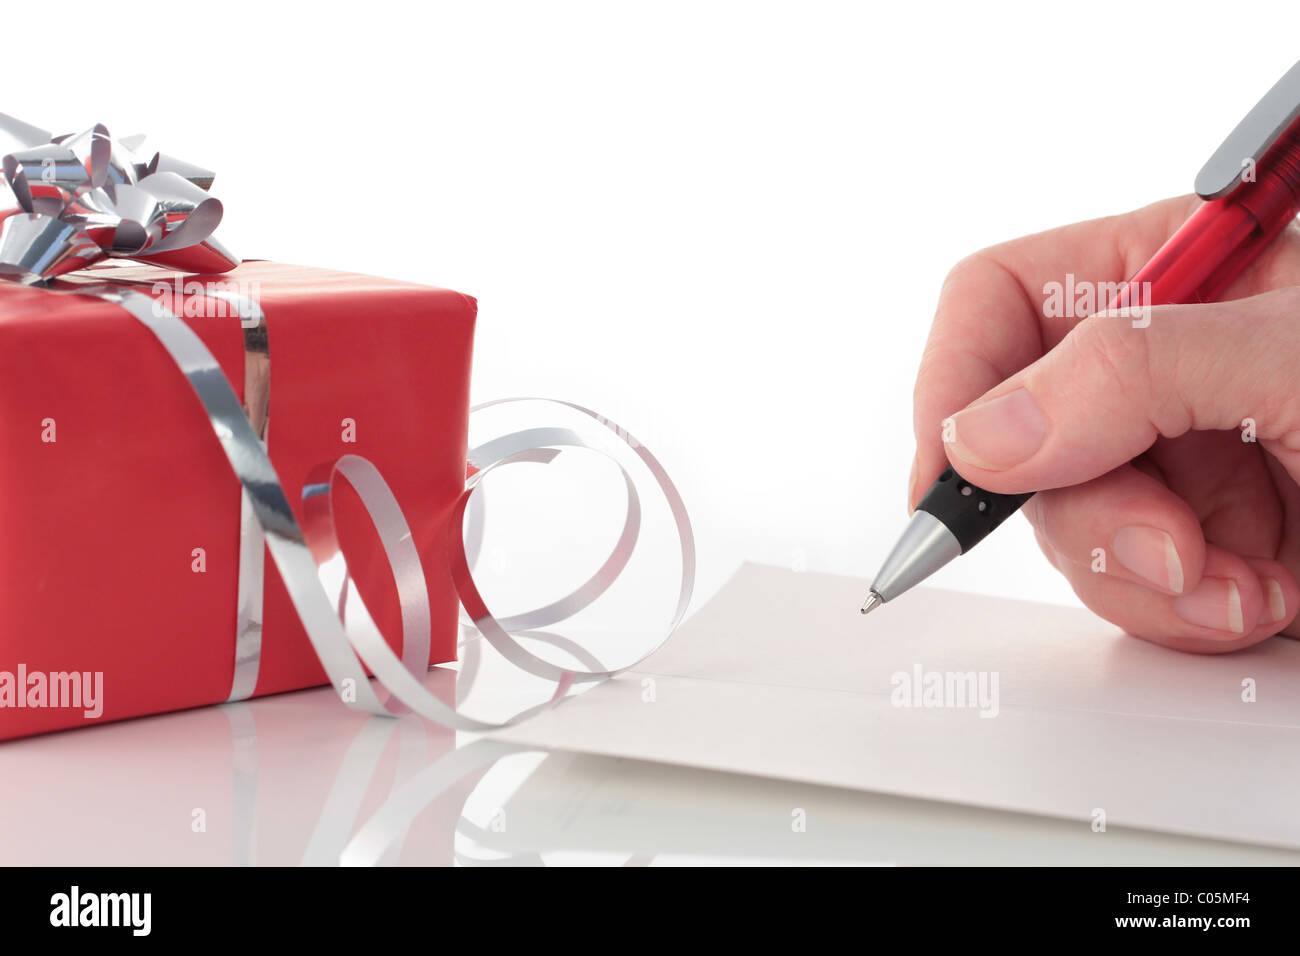 Handschrift in rot Valentinstag Geschenk-Karte Stockbild